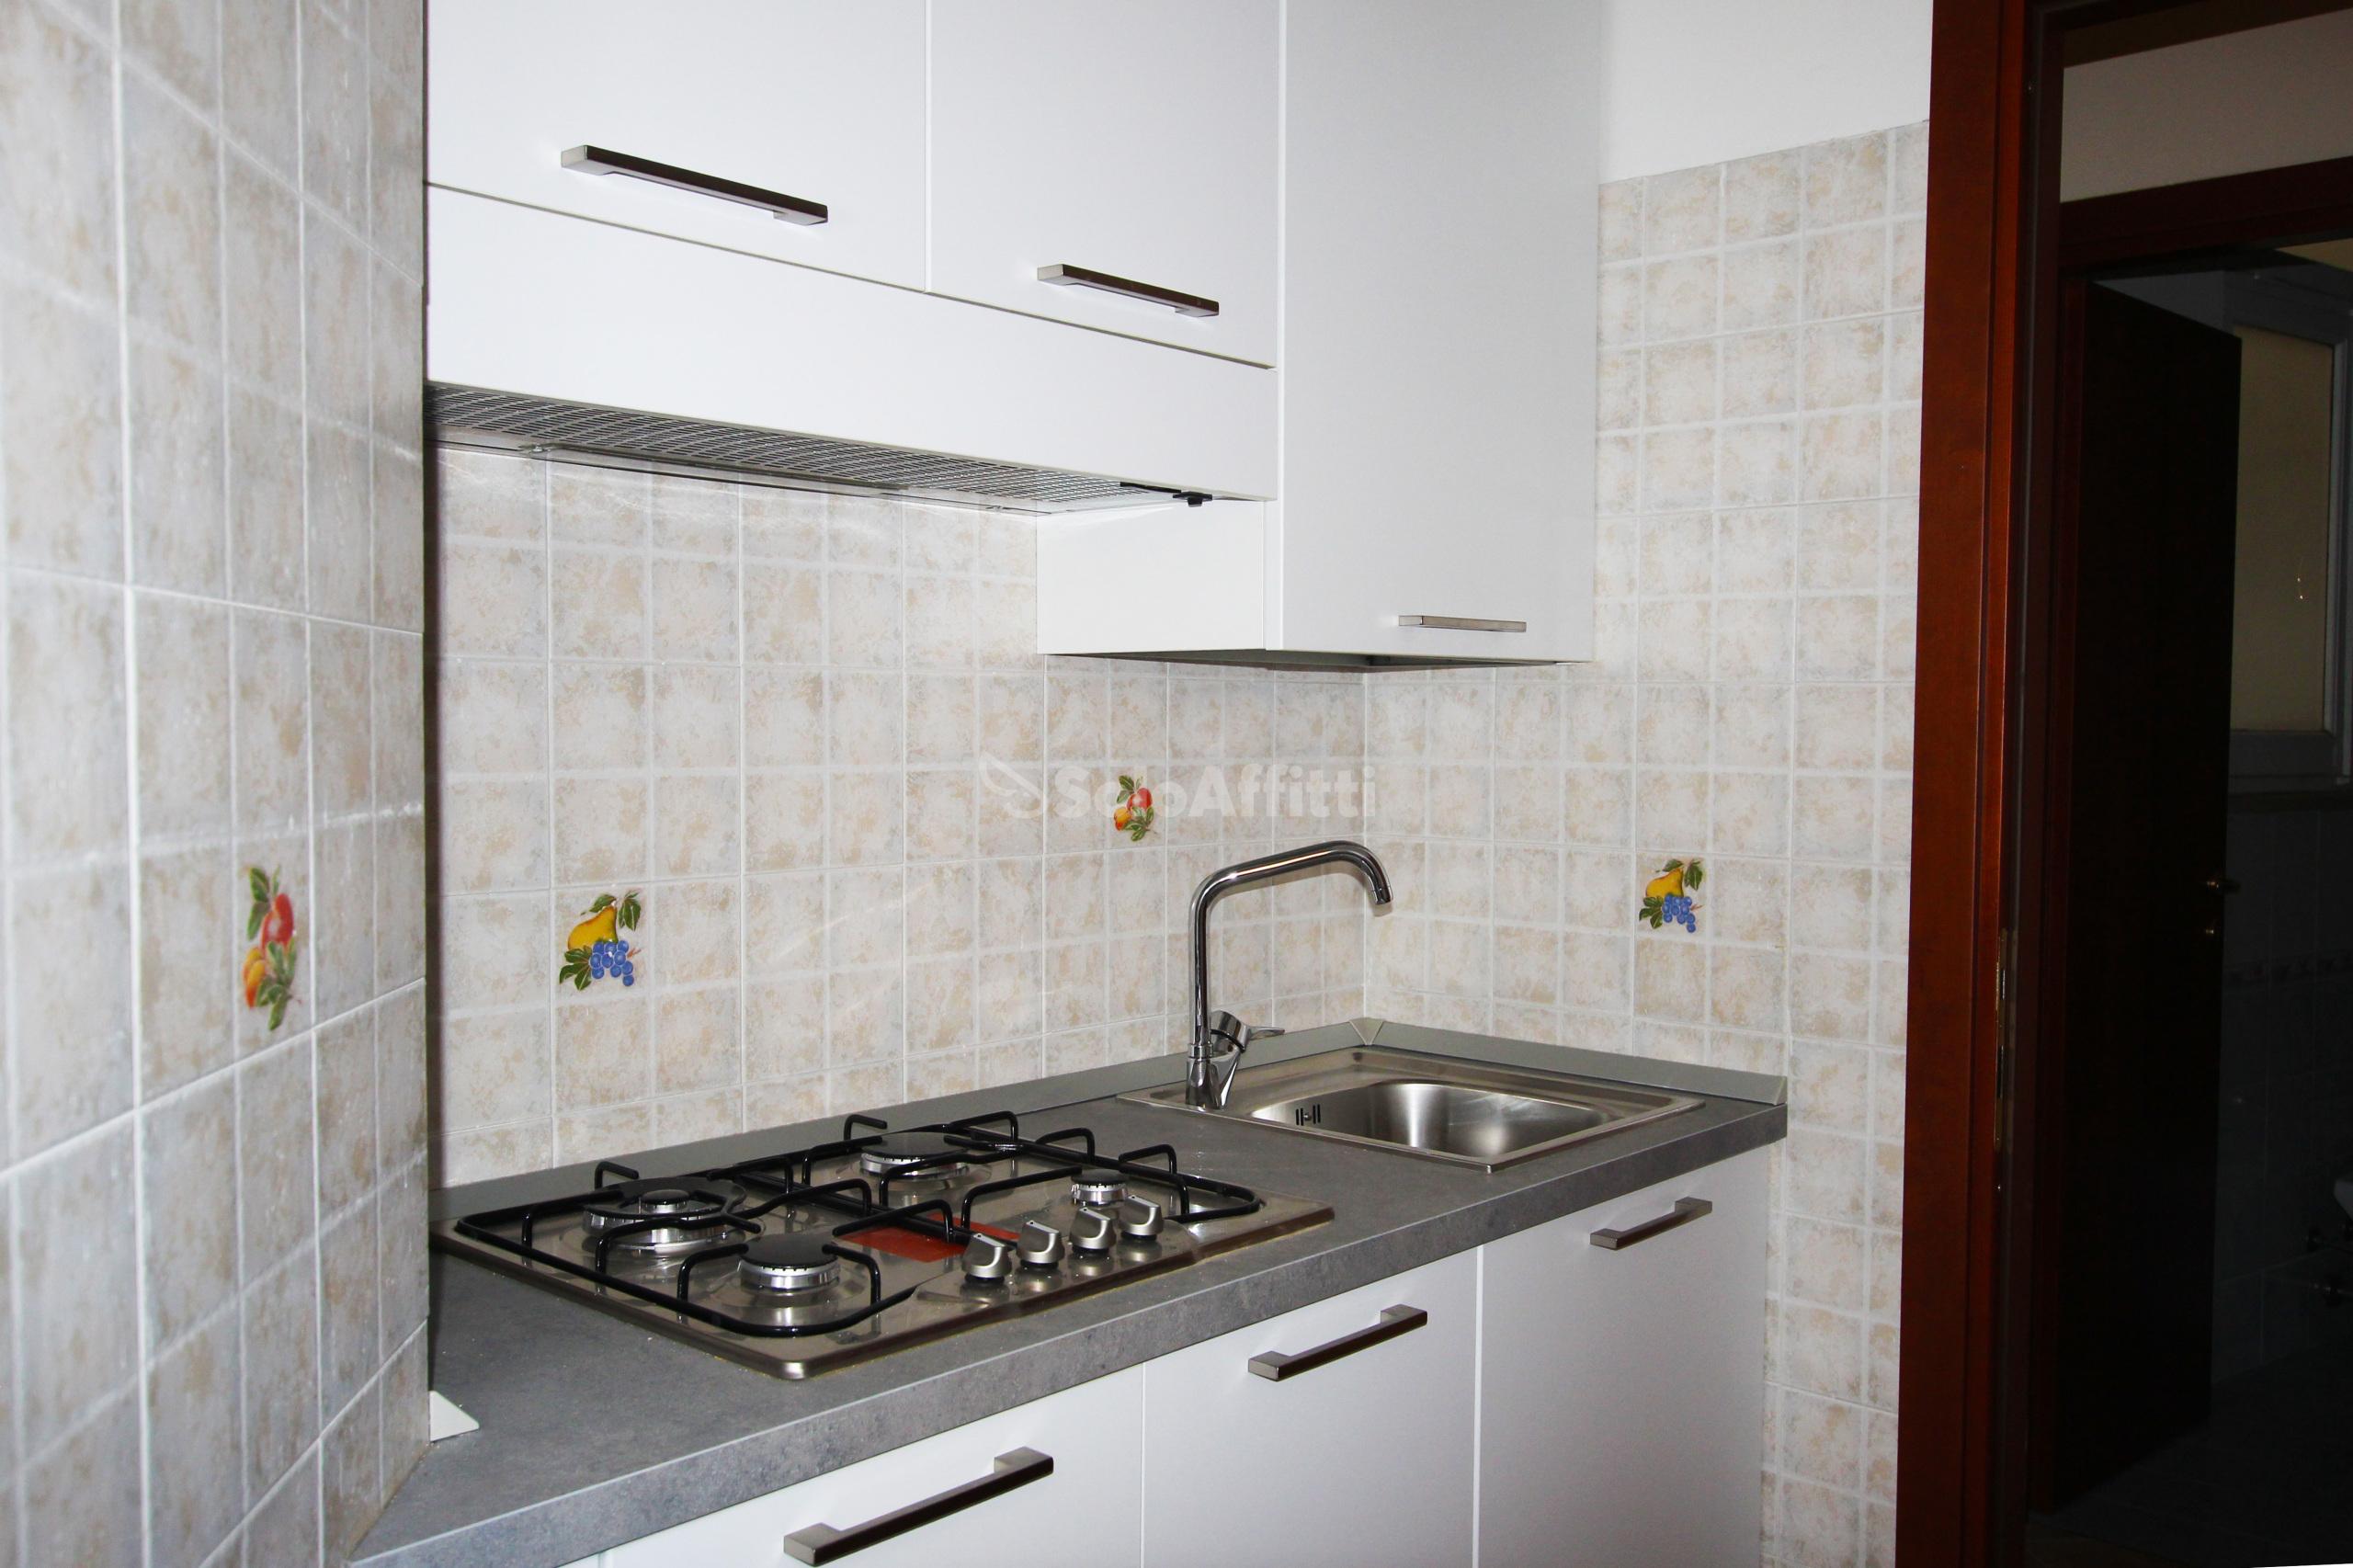 SoloAffitti  Parma1